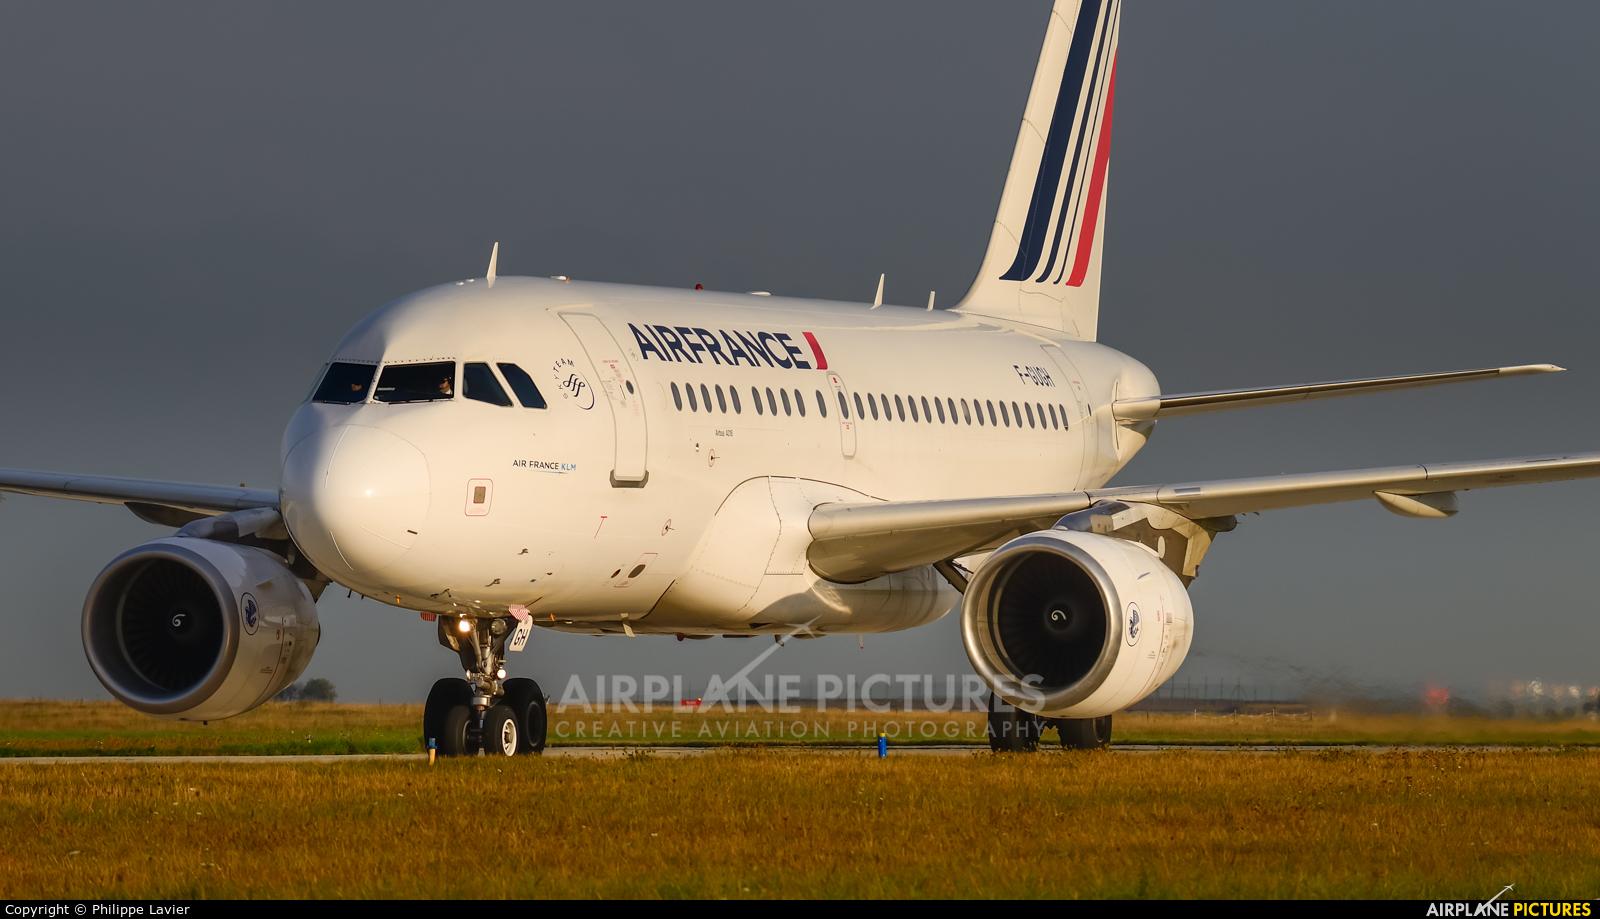 Air France F-GUGH aircraft at Paris - Charles de Gaulle